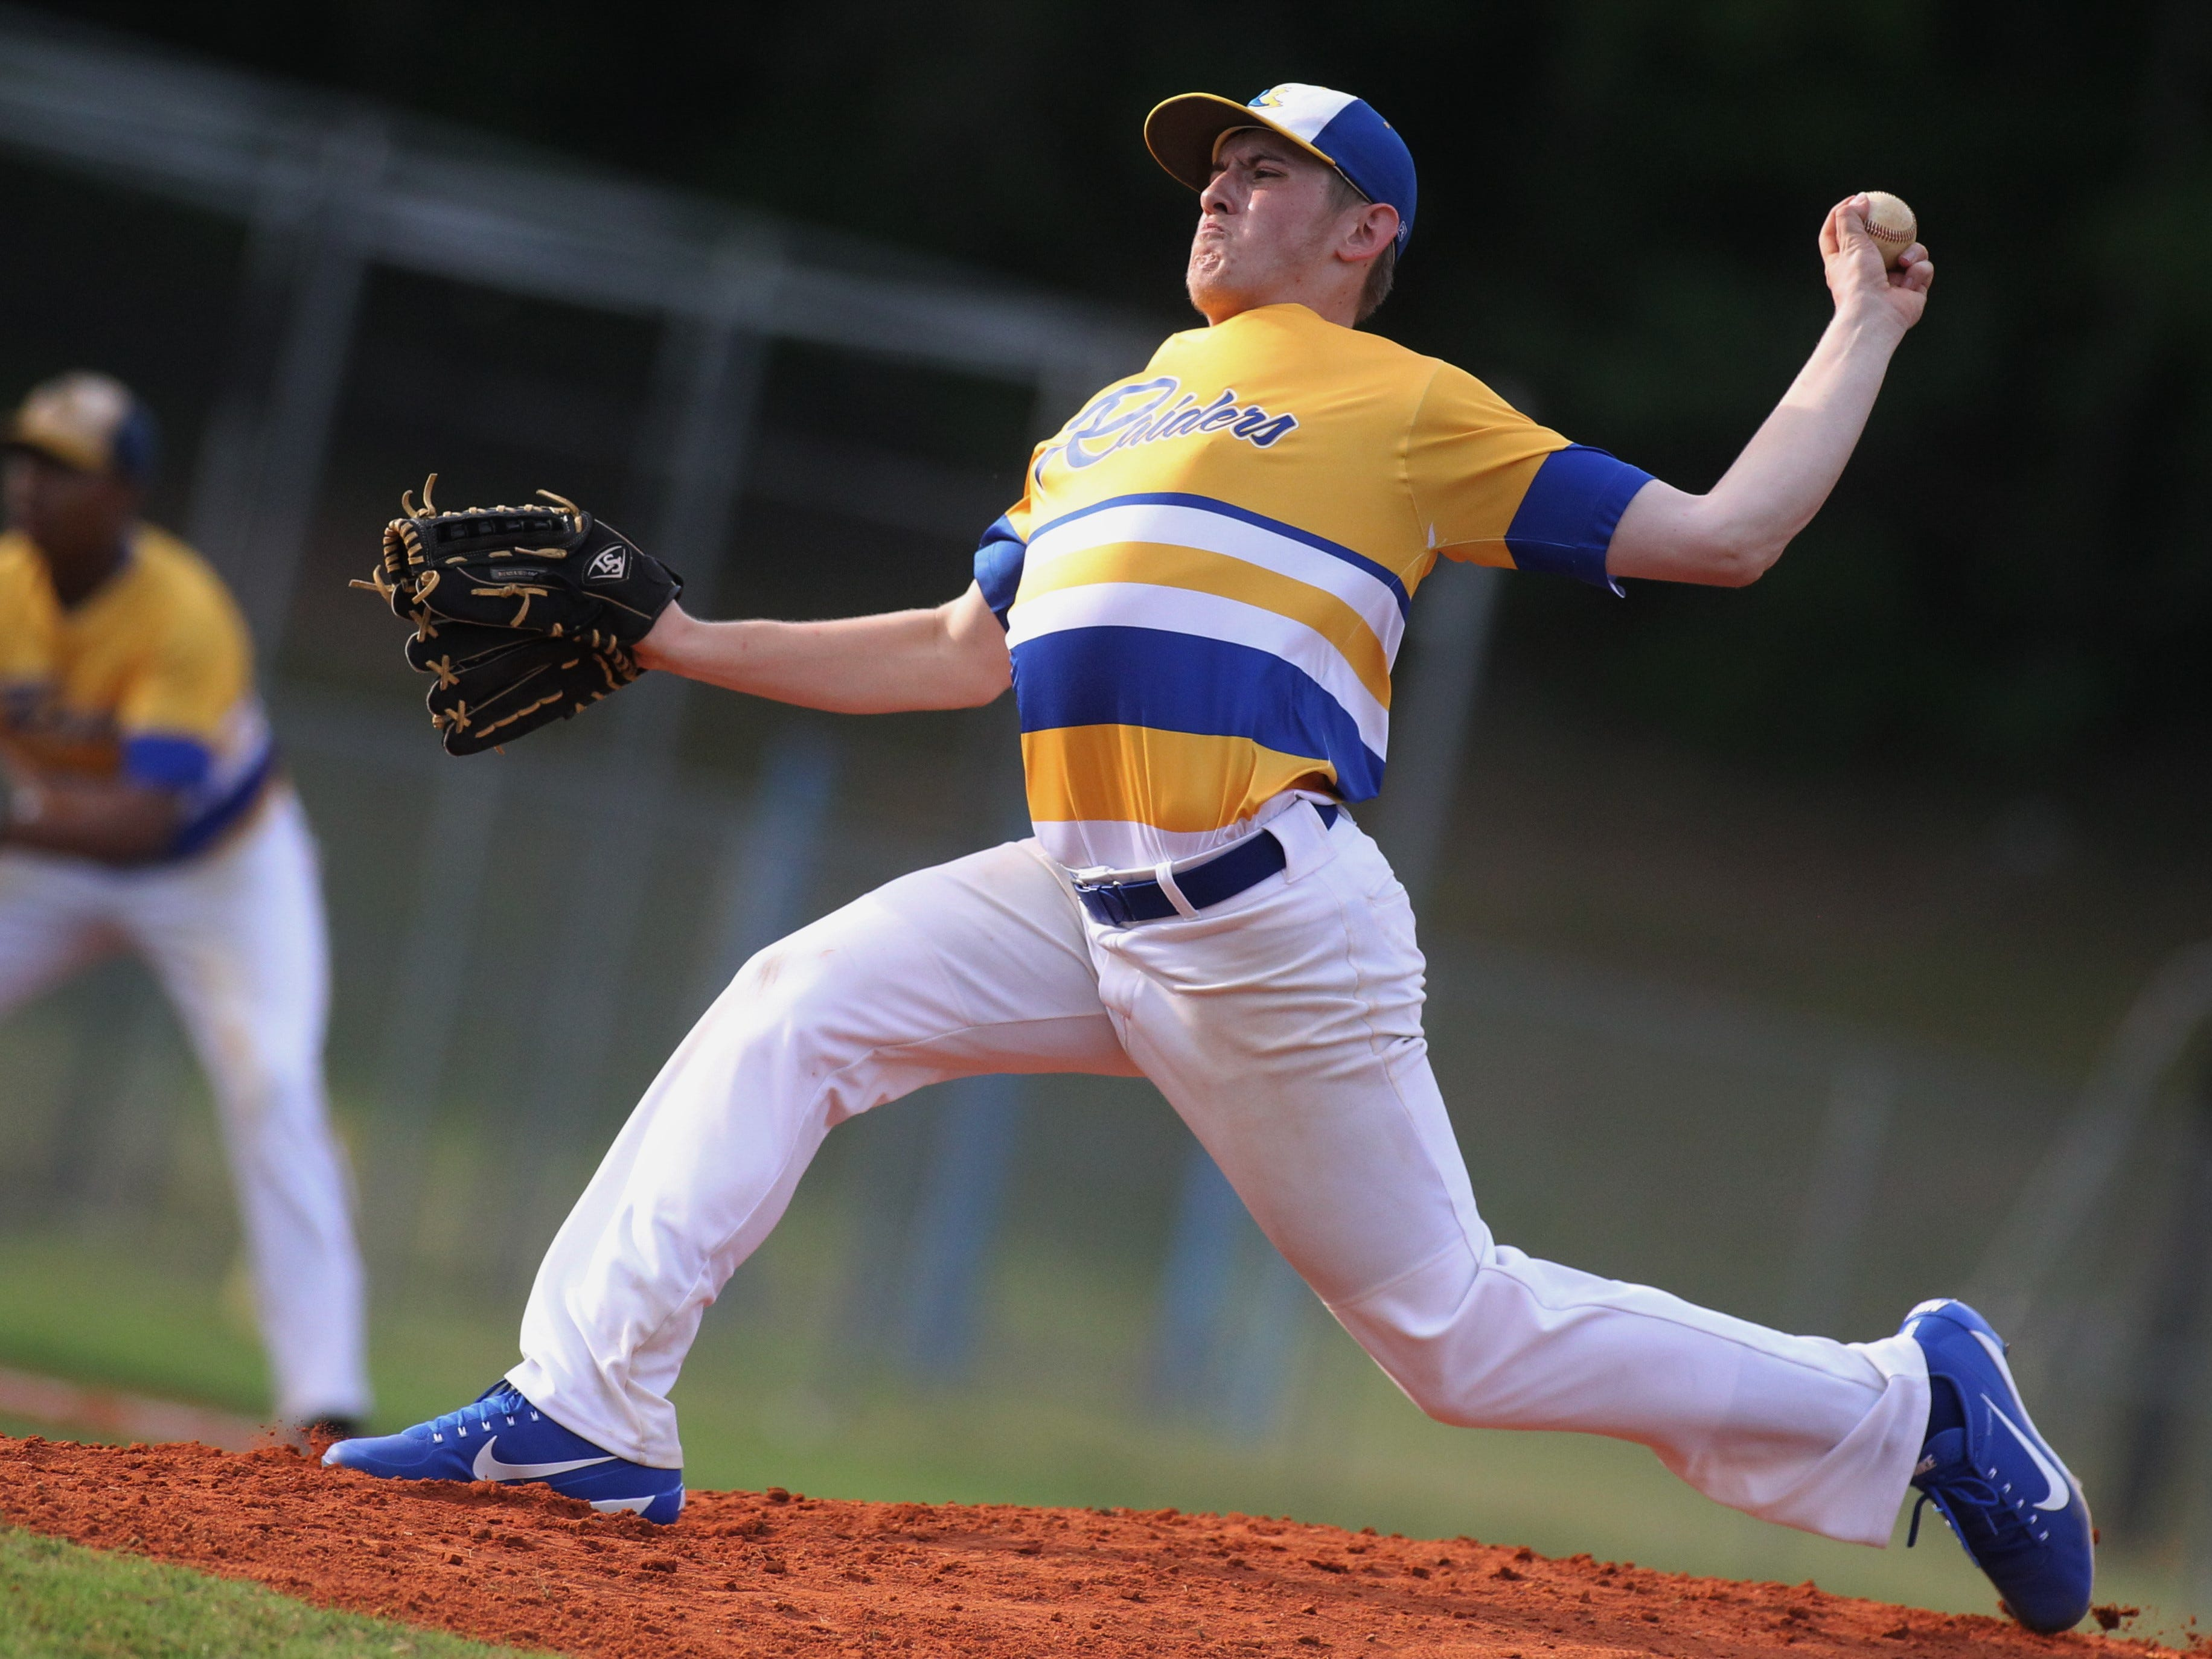 Rickards senior Justin Huber pitches as Rickards beat Gadsden County 18-0 in three innings on Friday, April 12, 2019.